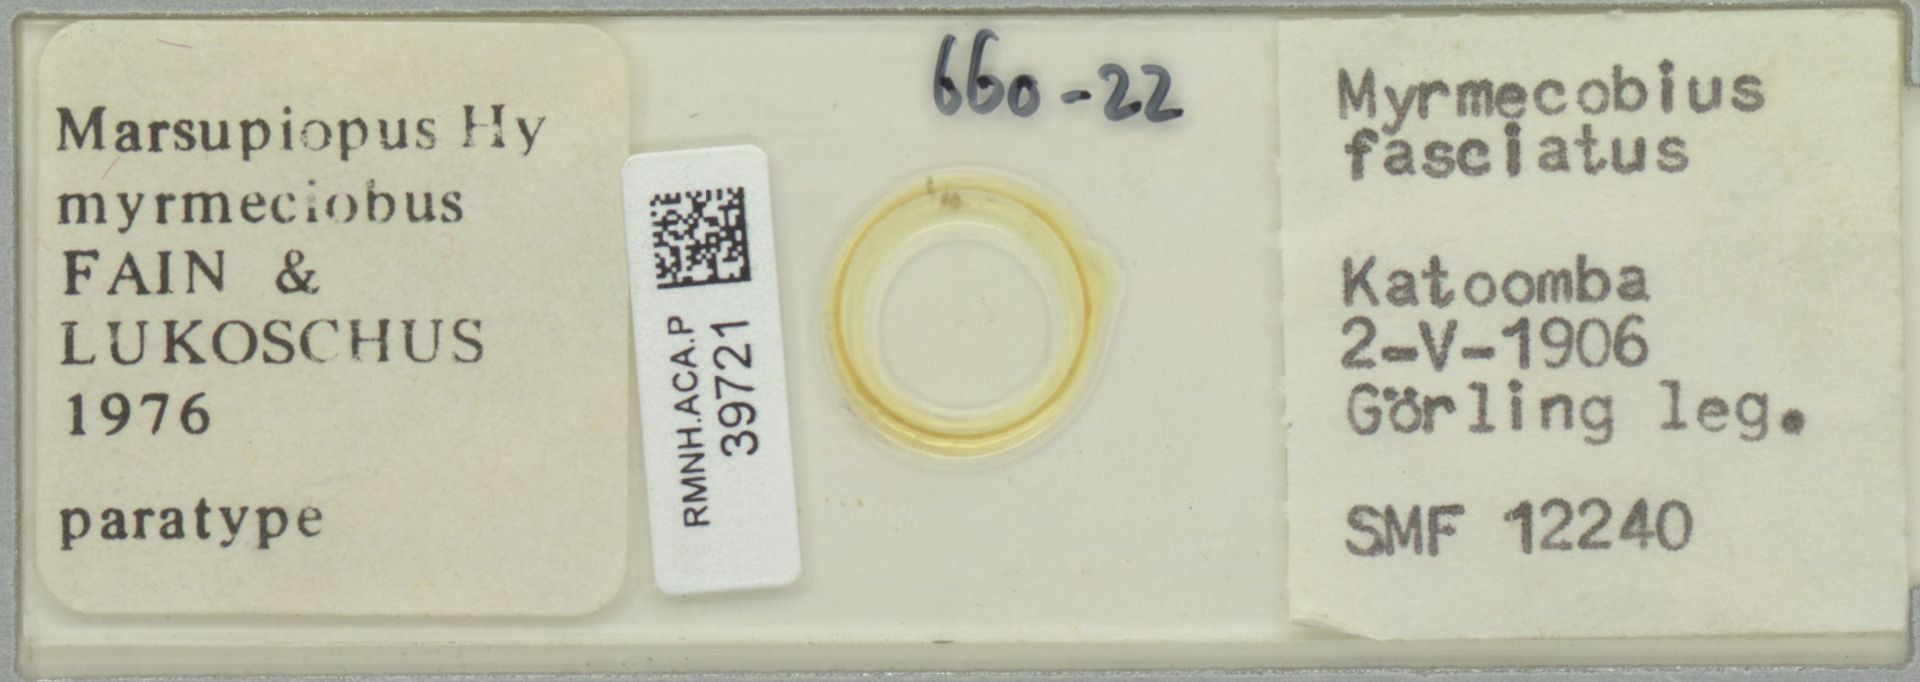 RMNH.ACA.P.39721 | Marsupiopus myrmeciobus FAIN & LUKOSCHUS 1976